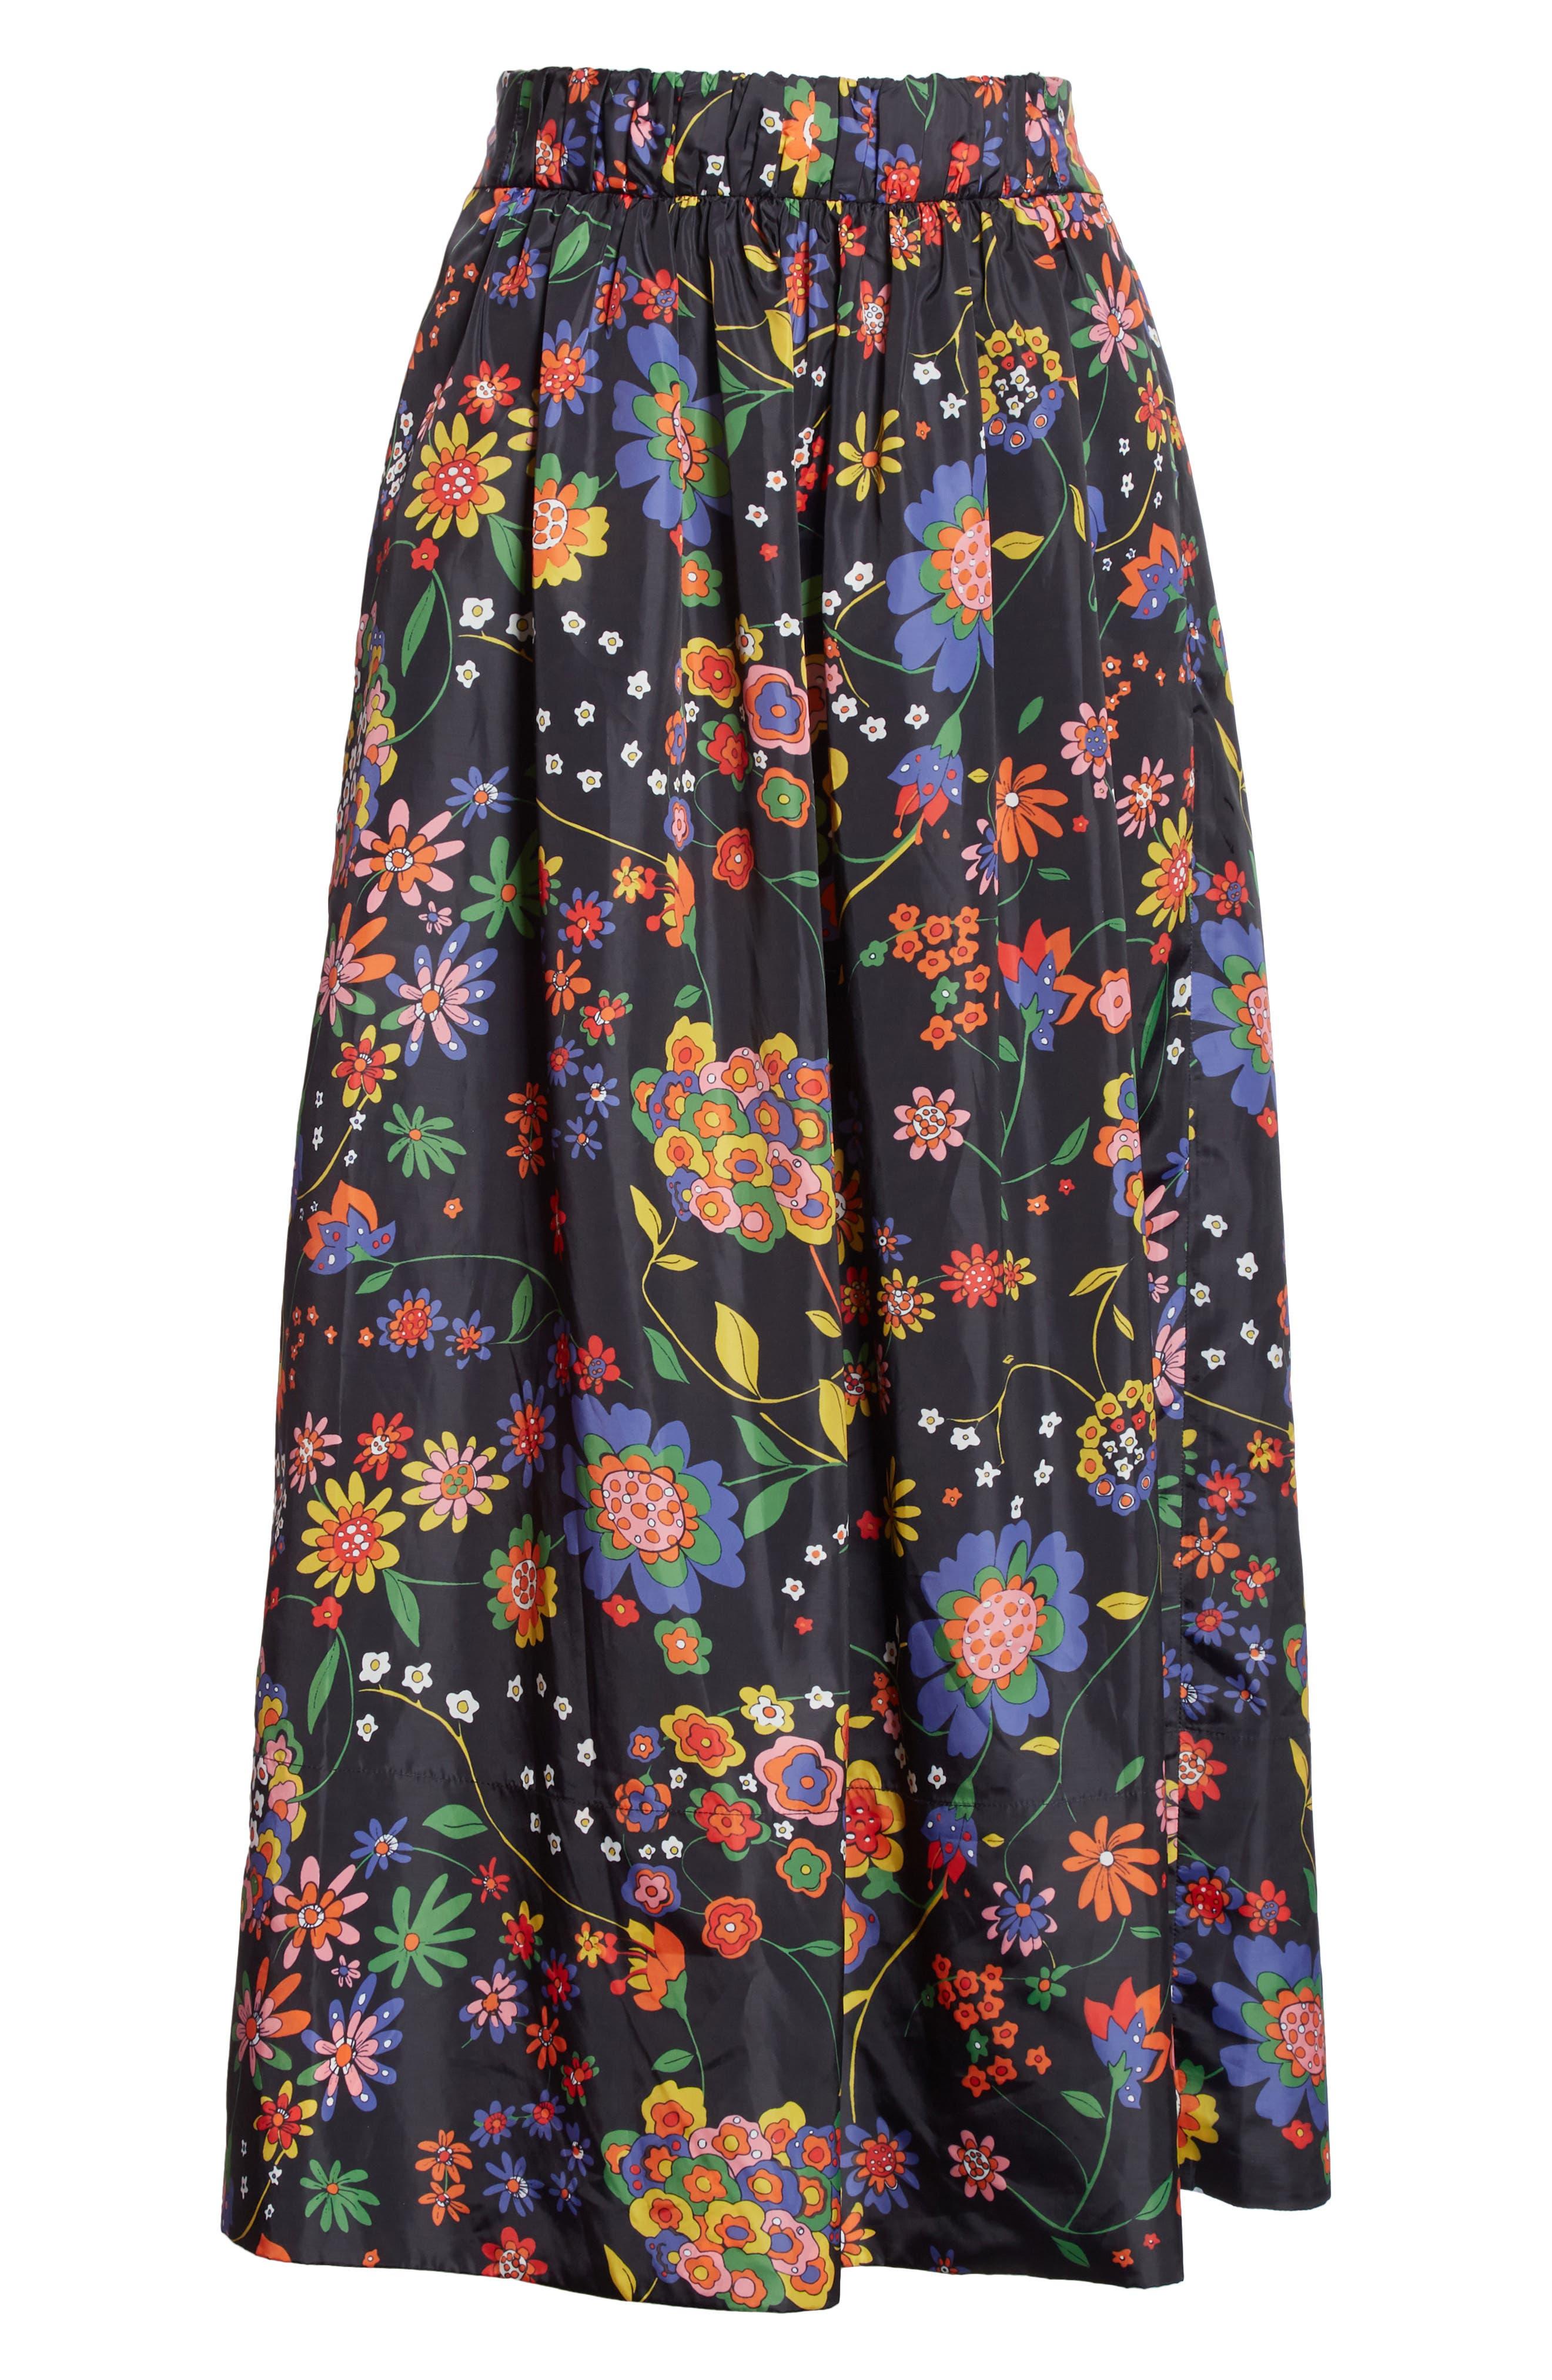 Print Tech Floral Skirt,                             Alternate thumbnail 6, color,                             402